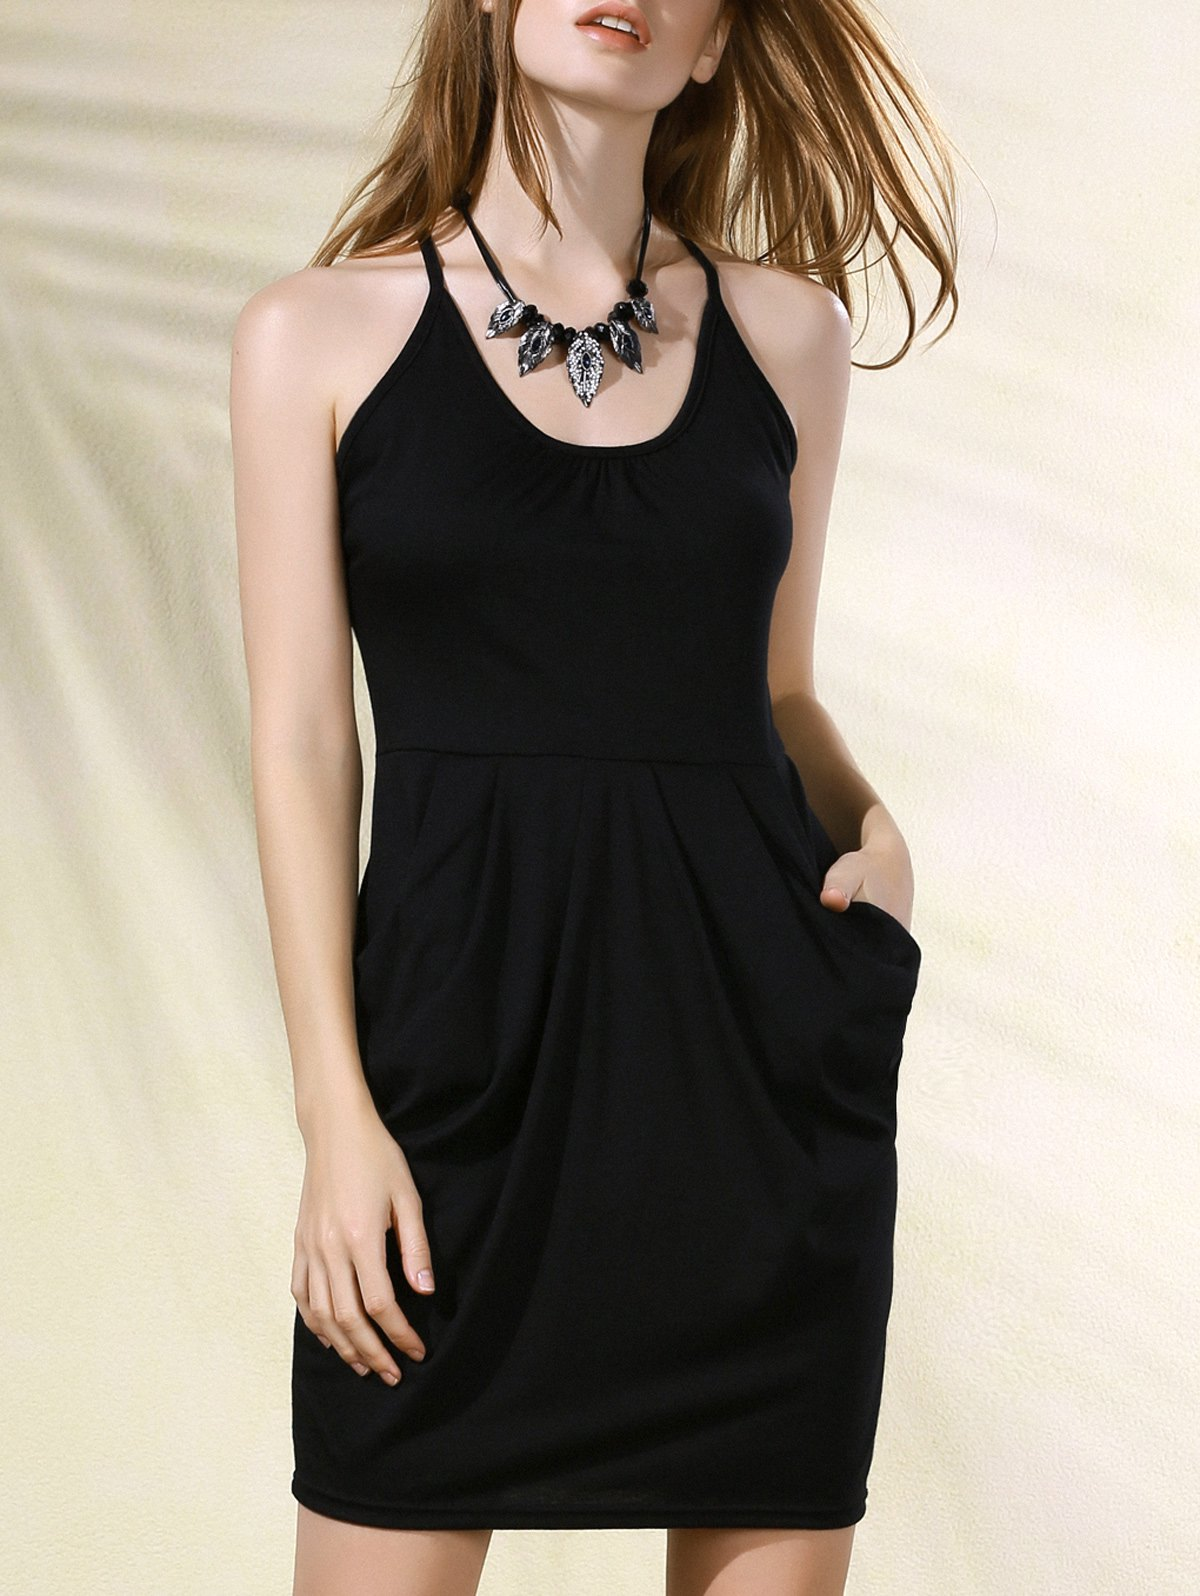 Spaghetti Strap Packet Buttocks Black Dress